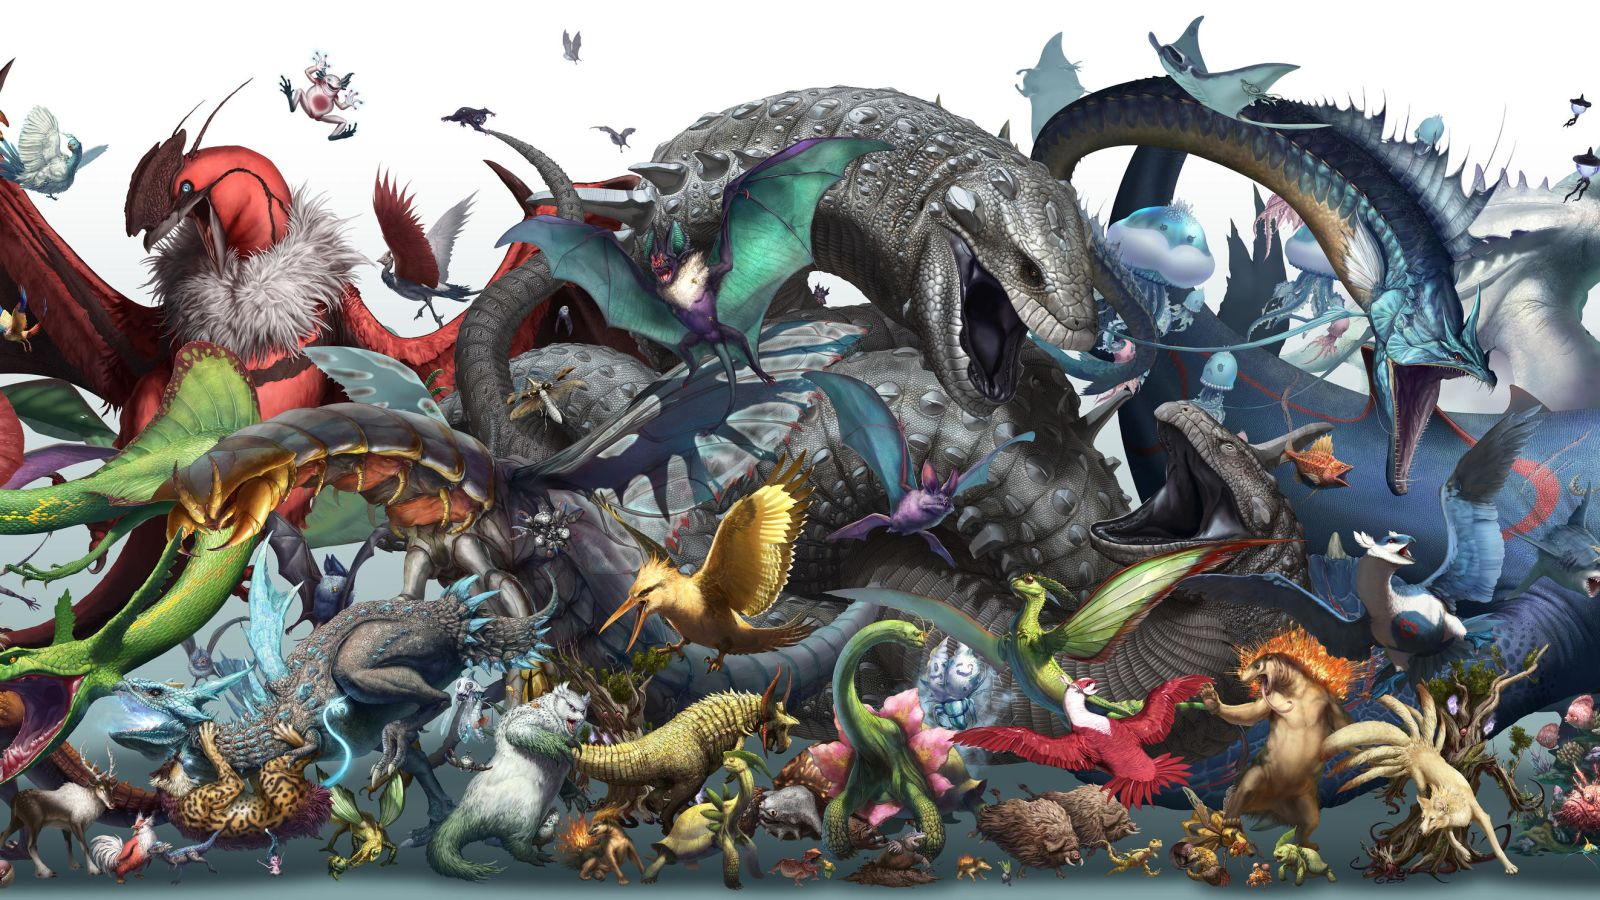 13 Detective Pikachu Charizard Wallpapers On Wallpapersafari